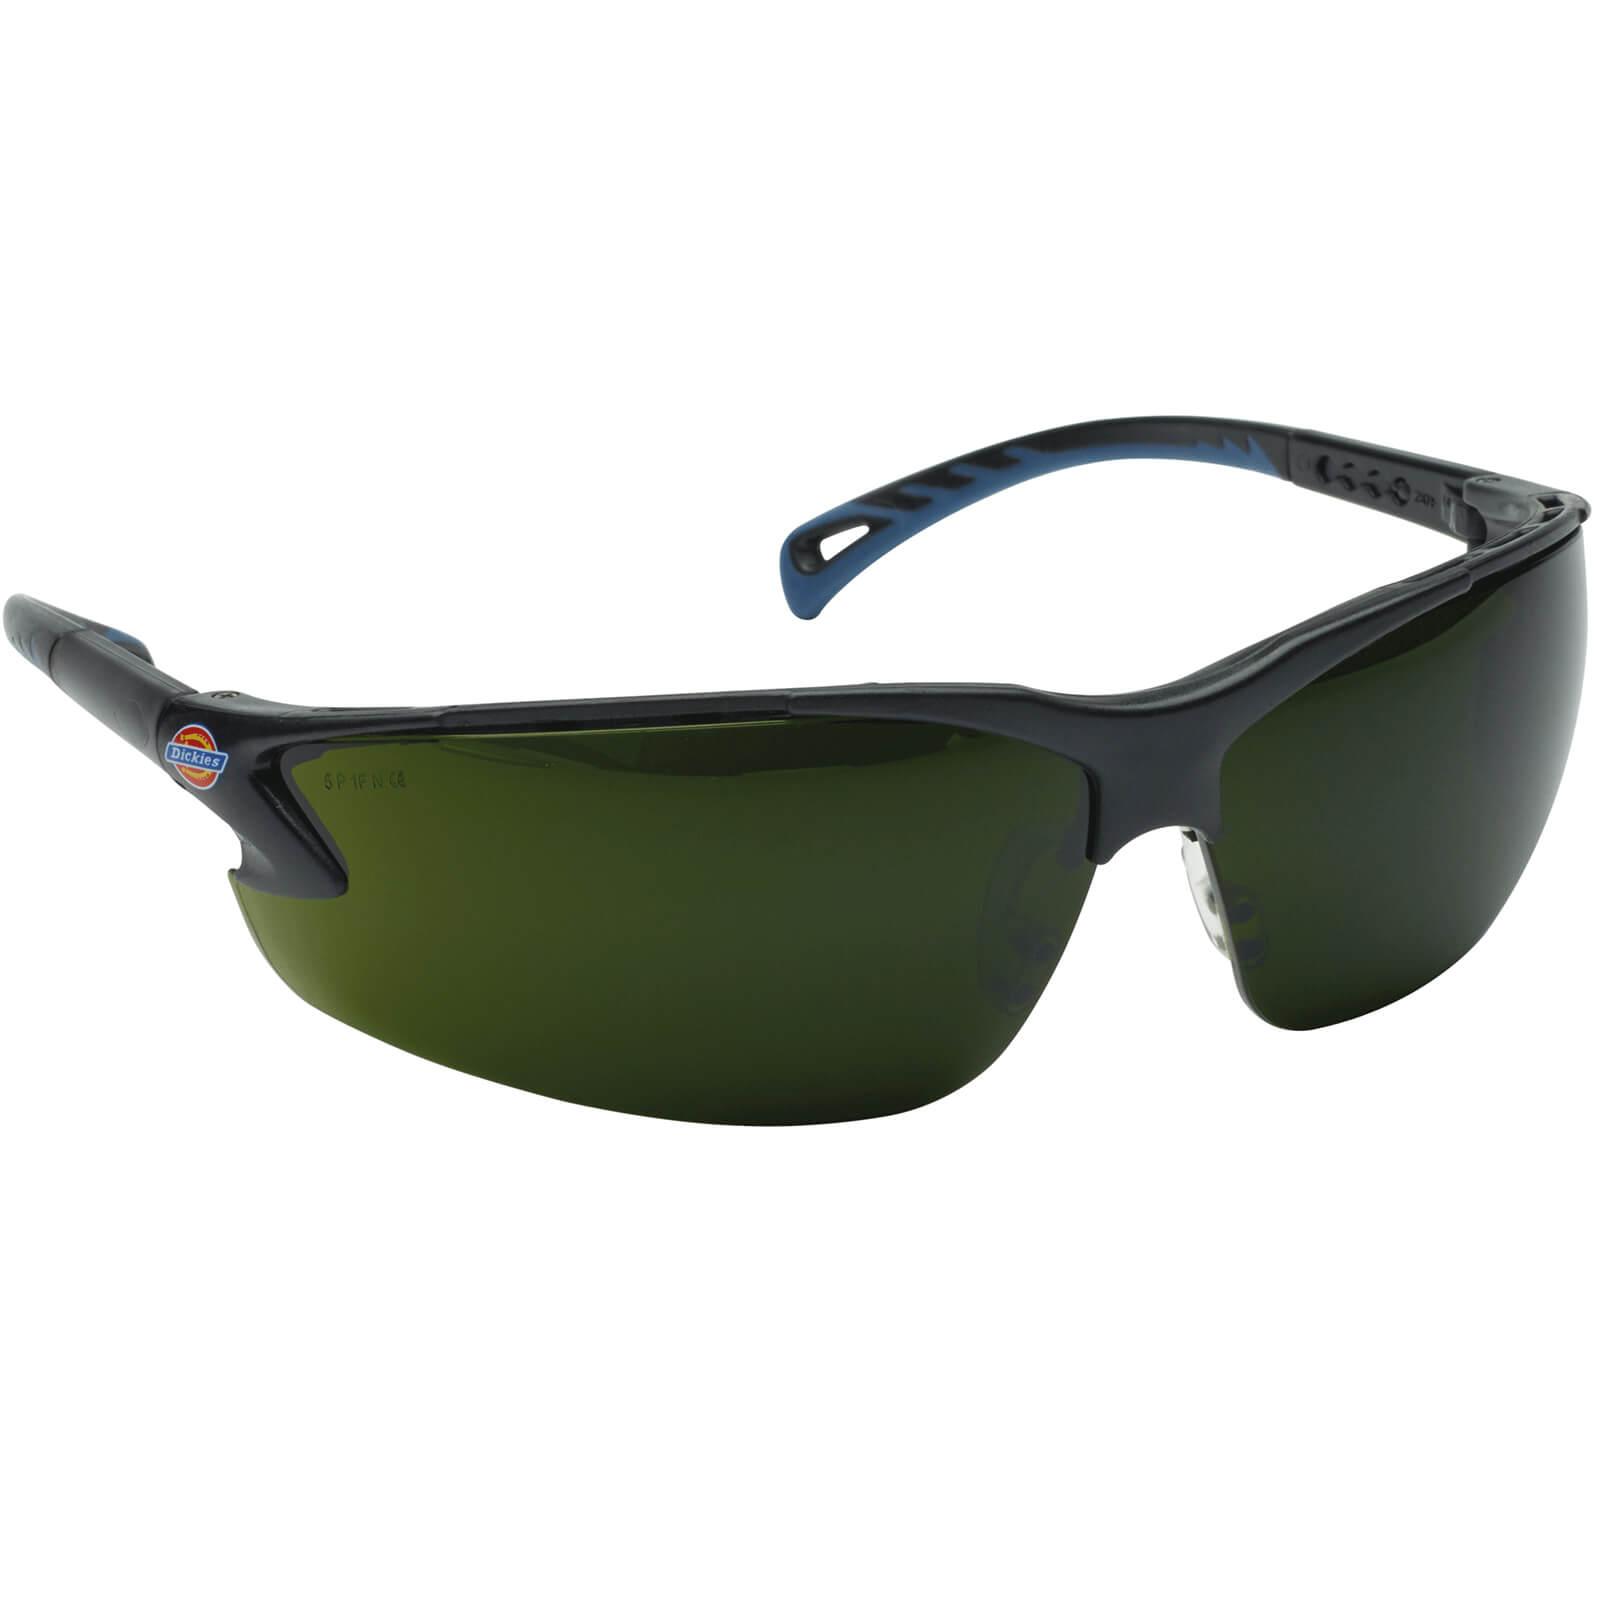 Image of Dickies Enhanced Contrast Welders Safety Glasses